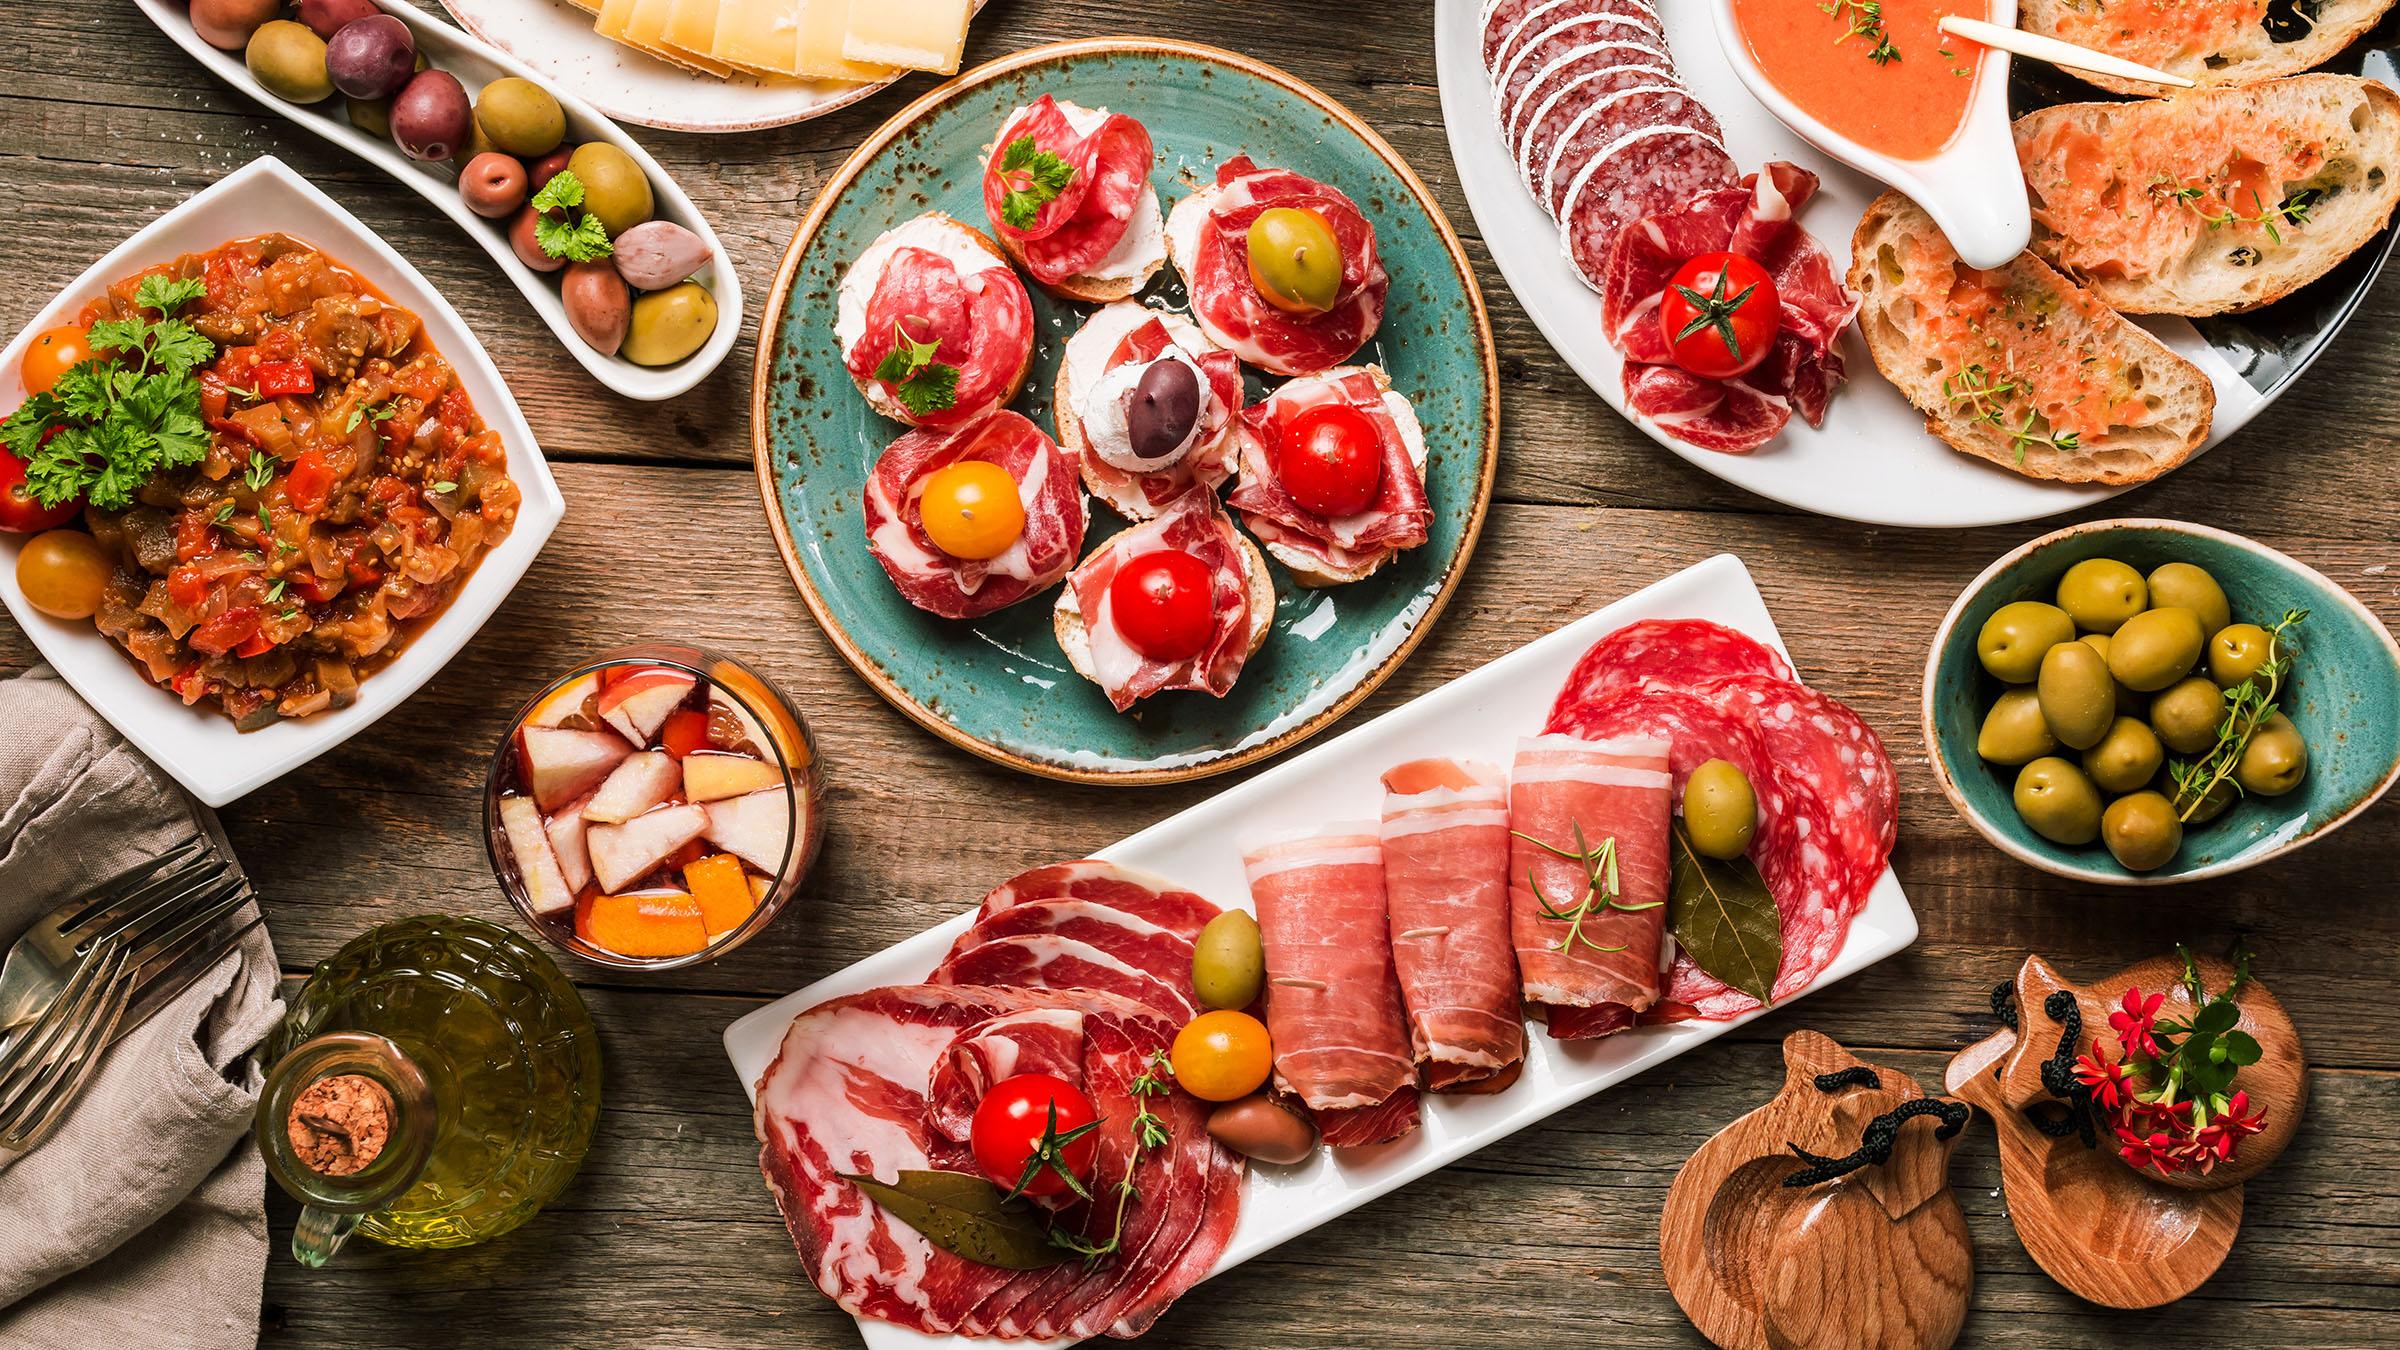 corso-ecommerce-gastronomia-online